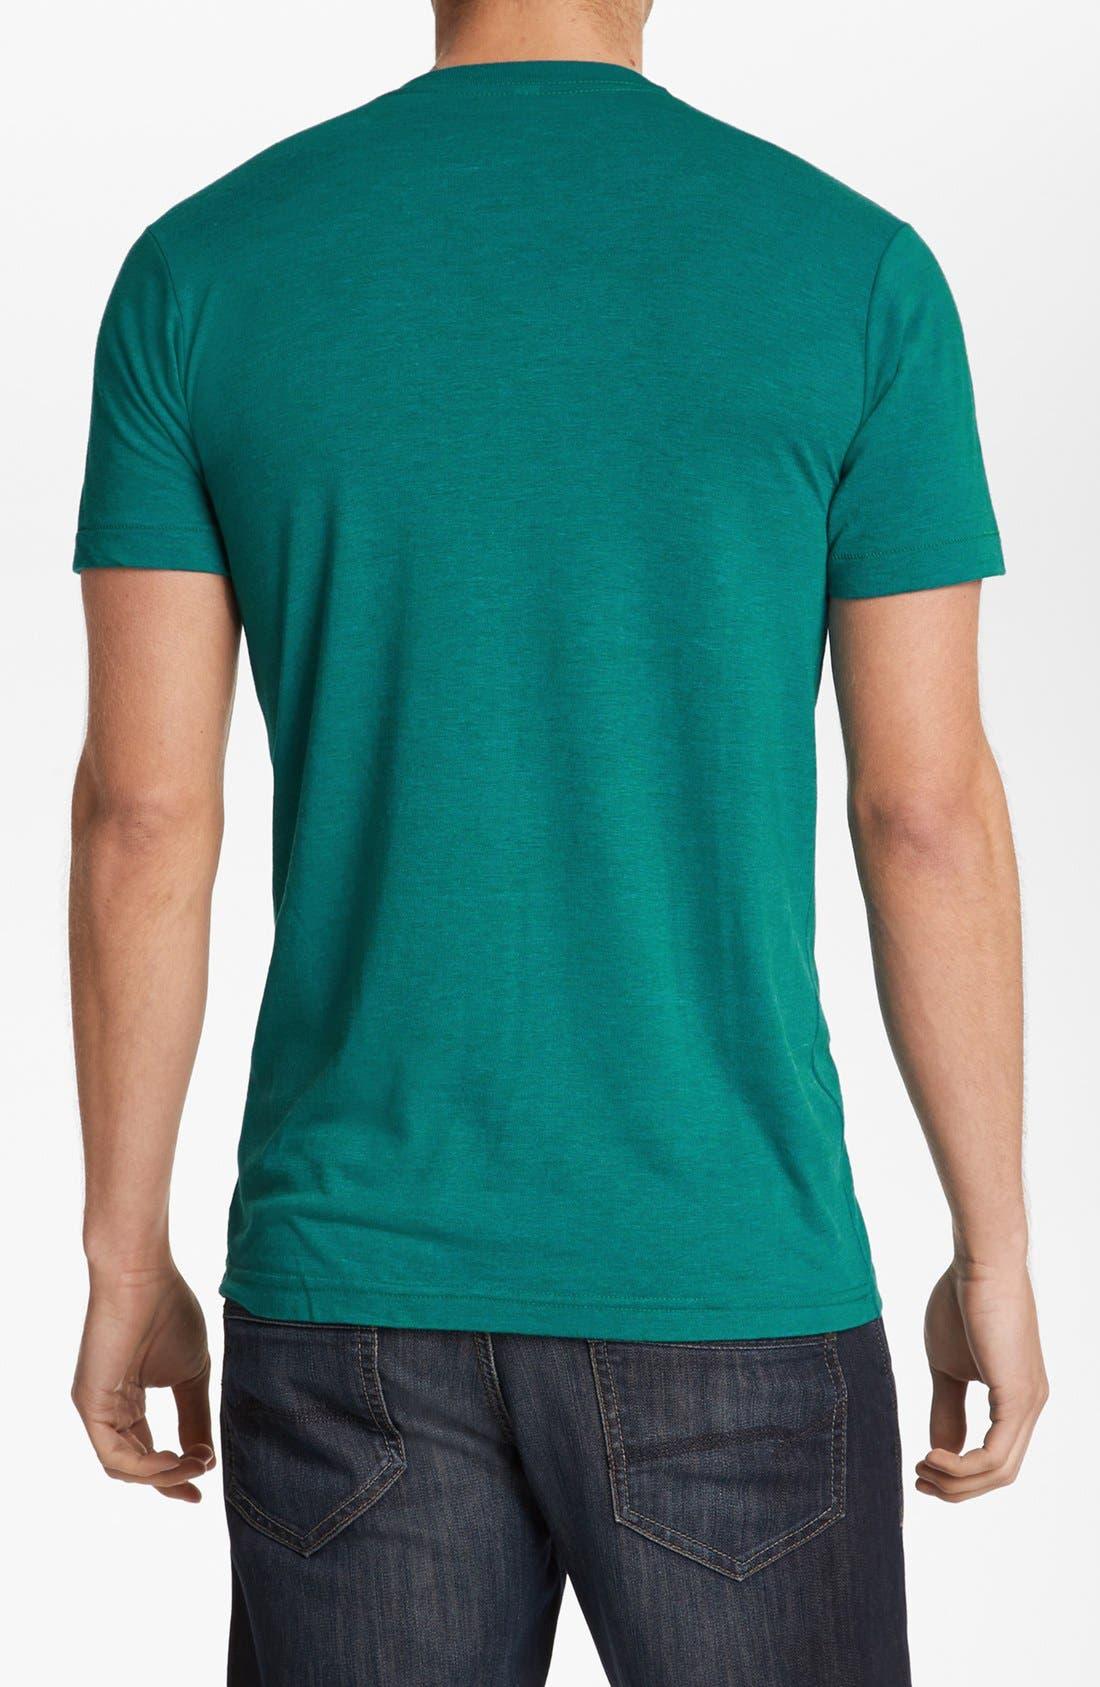 Alternate Image 2  - Casual Industrees 'Umbrella Rain' Graphic T-Shirt